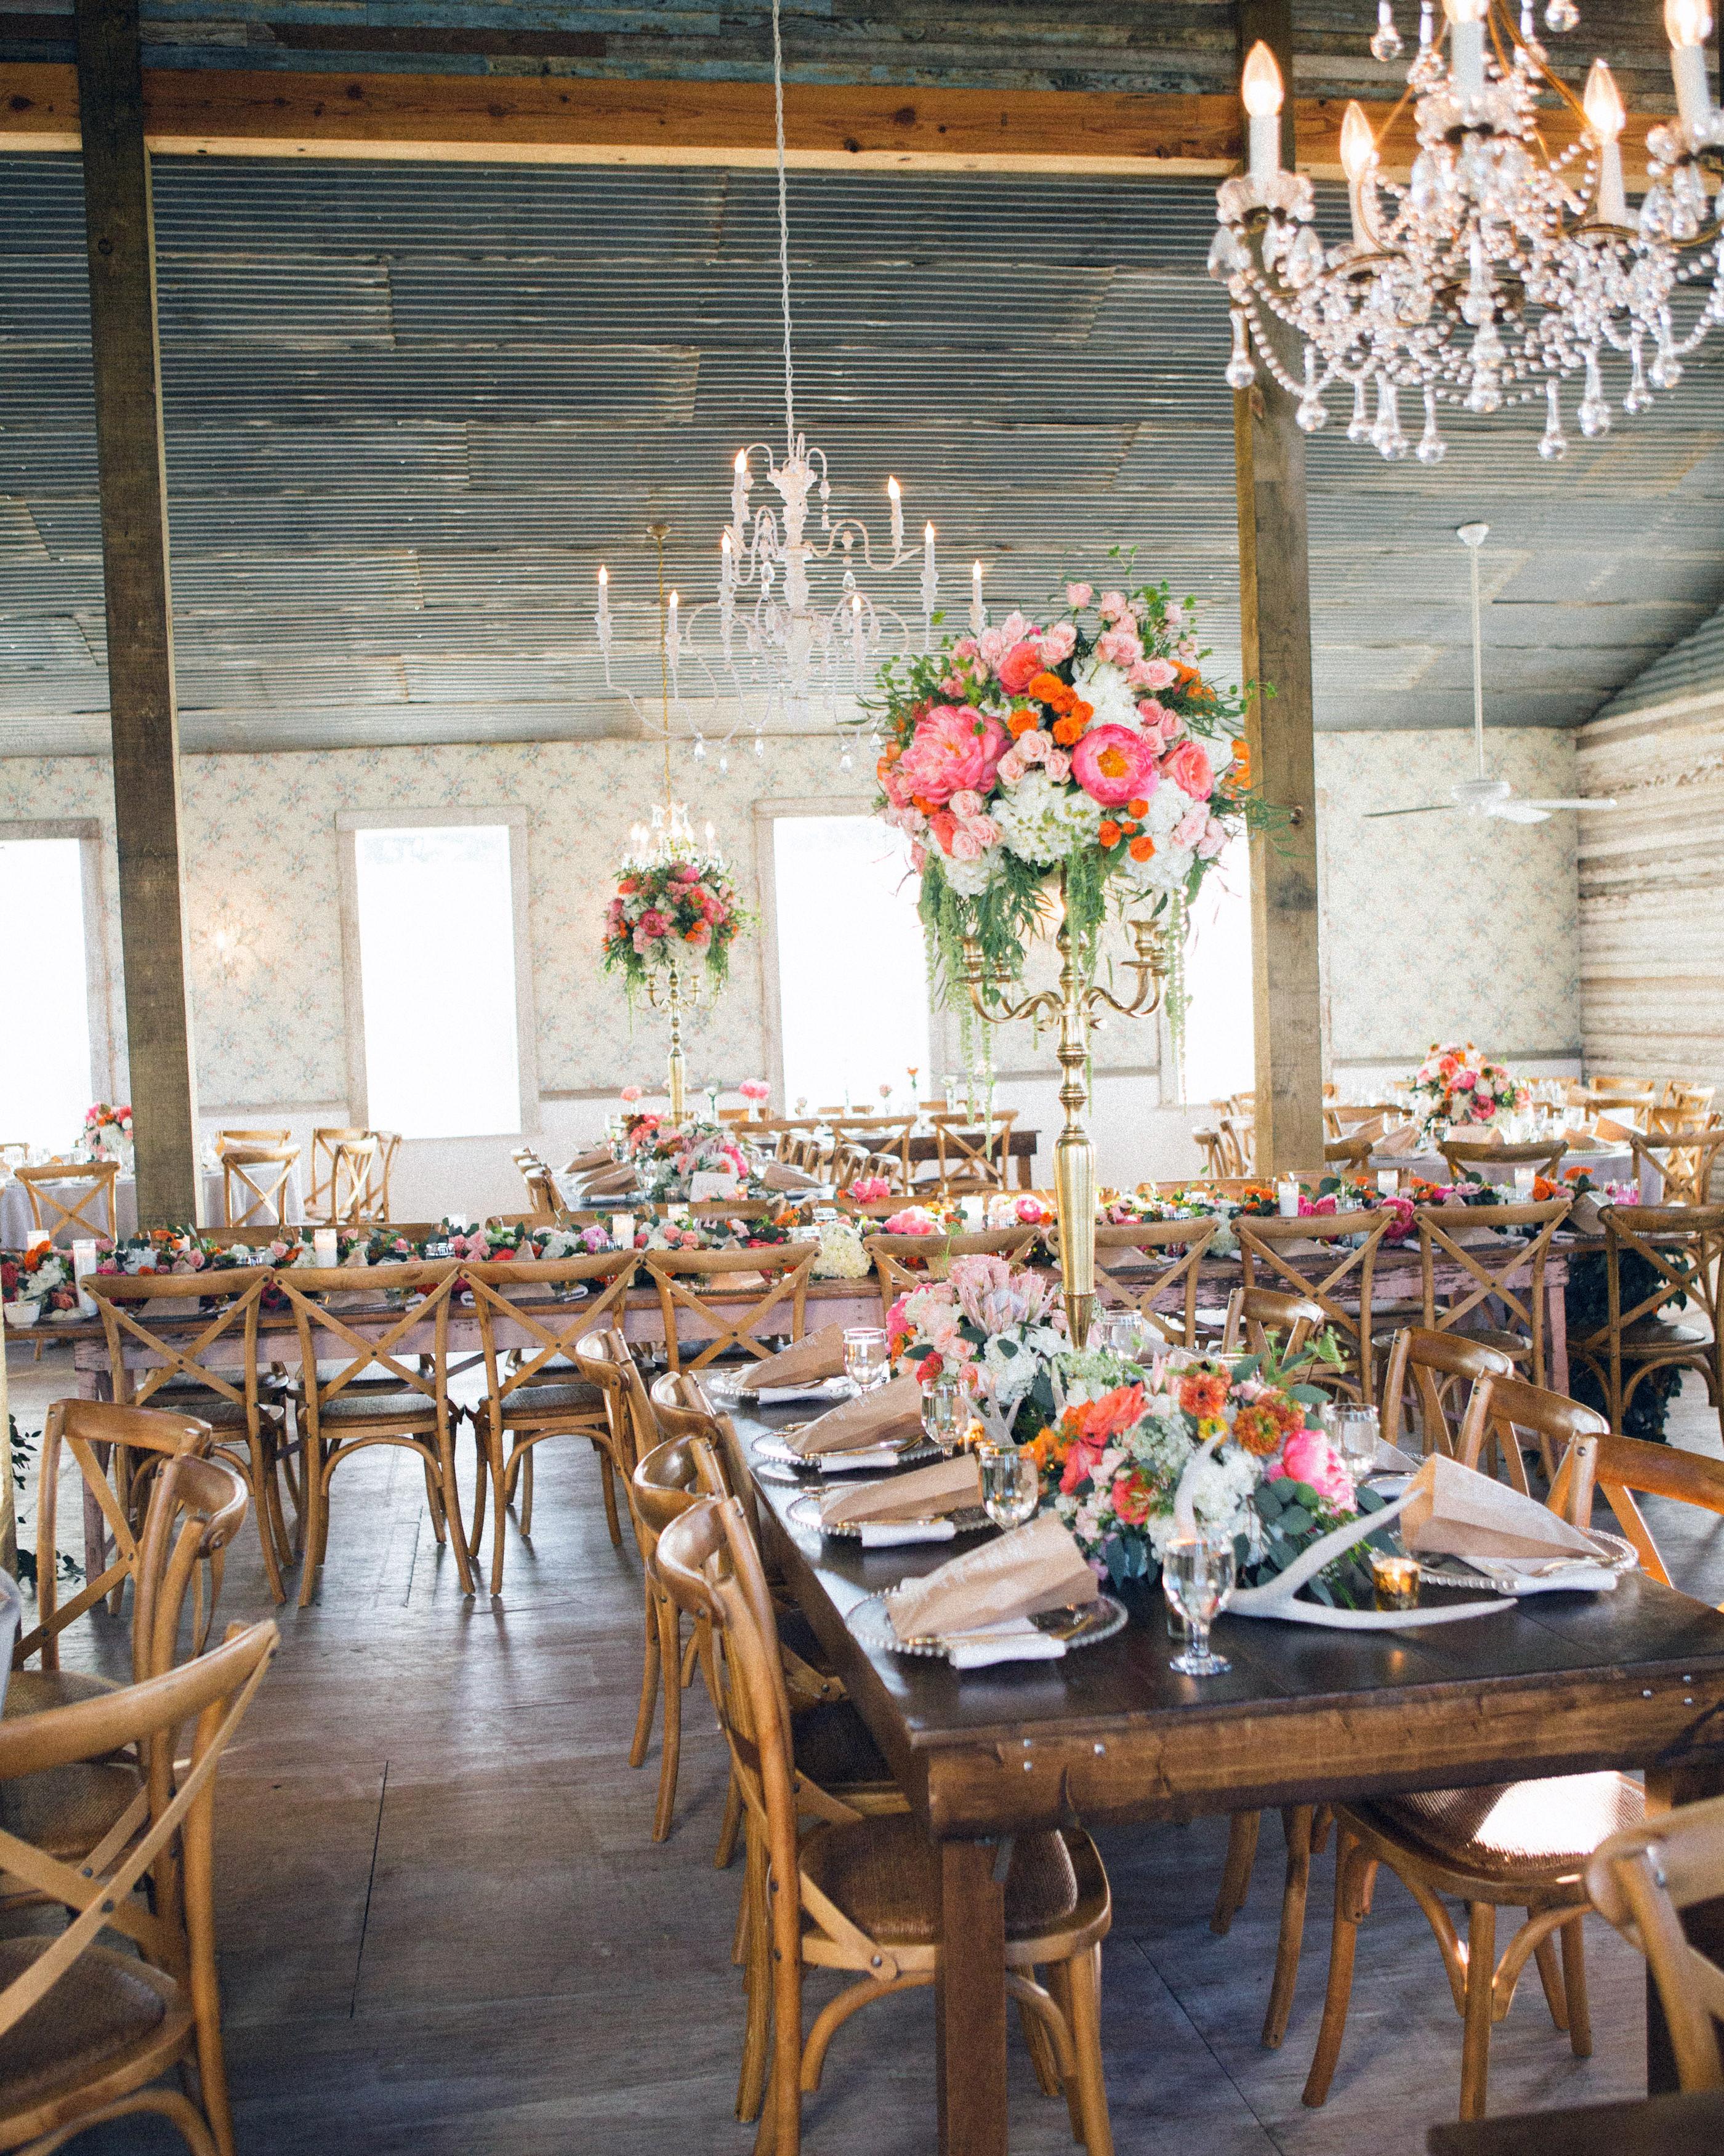 leah-michael-wedding-reception-1629-s111861-0515.jpg